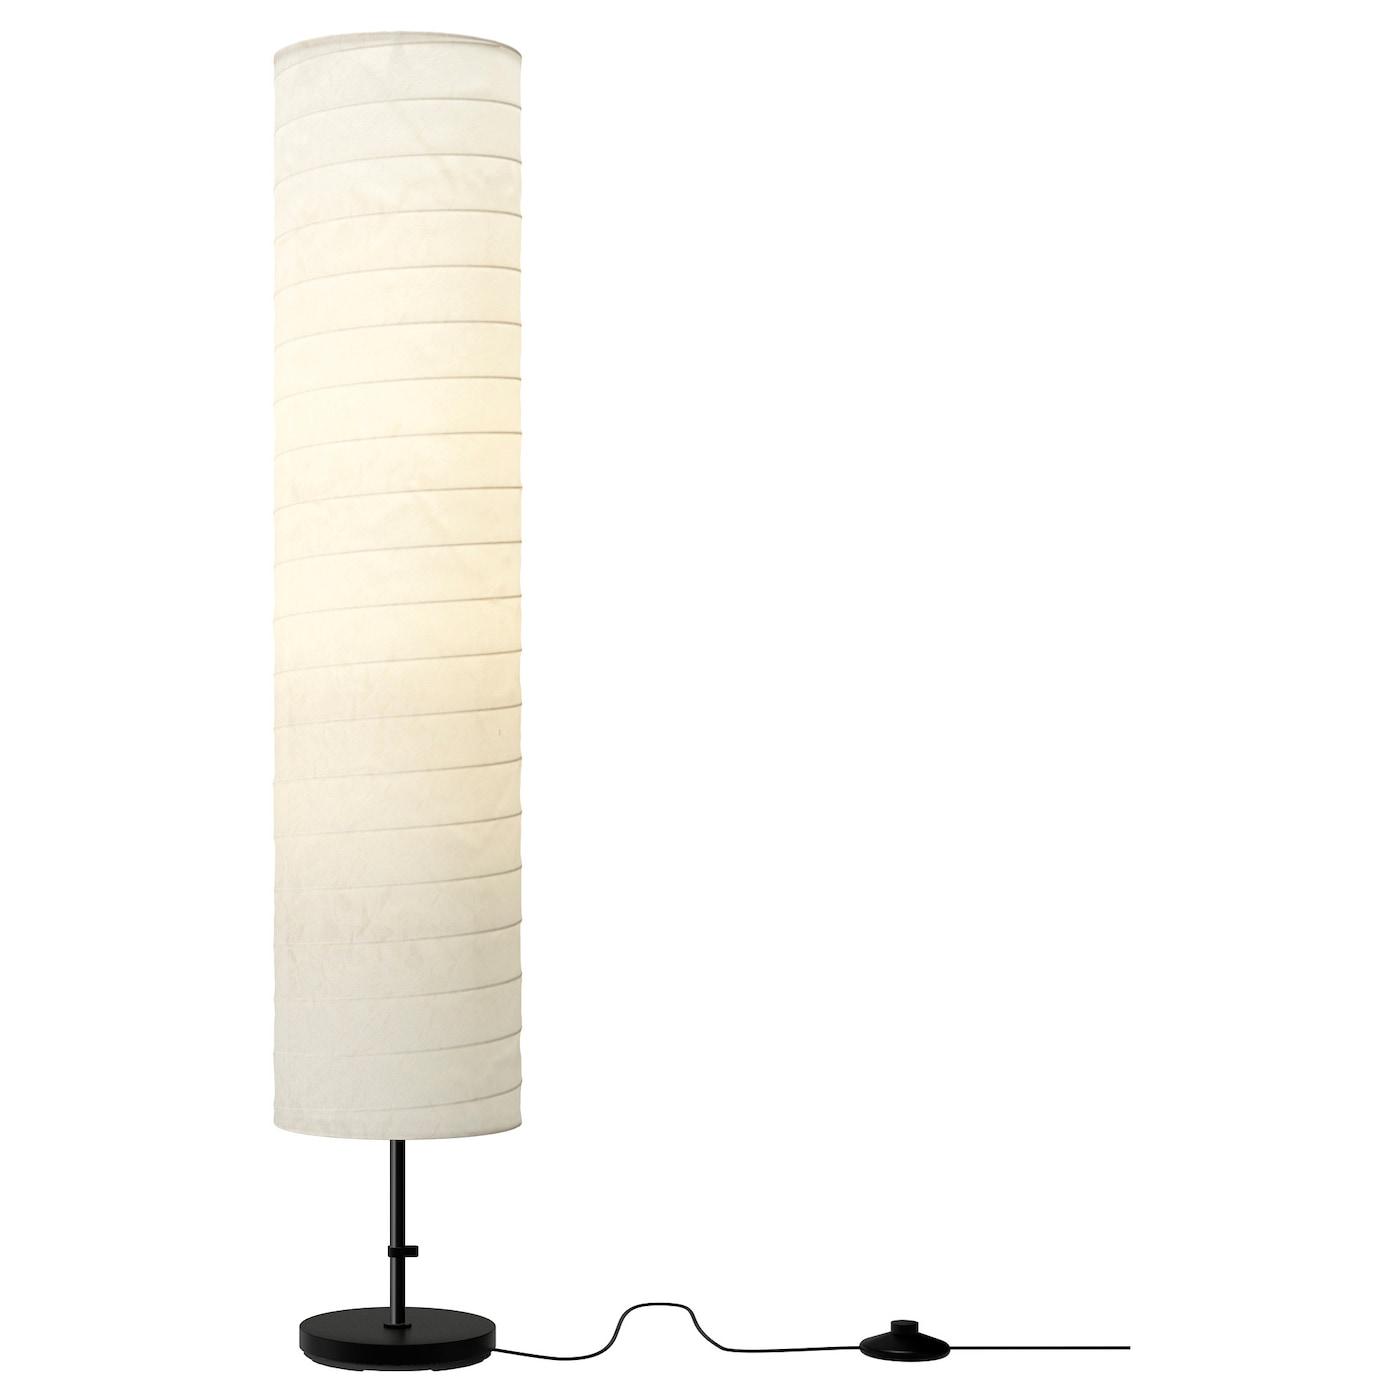 Holm floor lamp ikea ikea holm floor lamp gives a soft mood light aloadofball Image collections